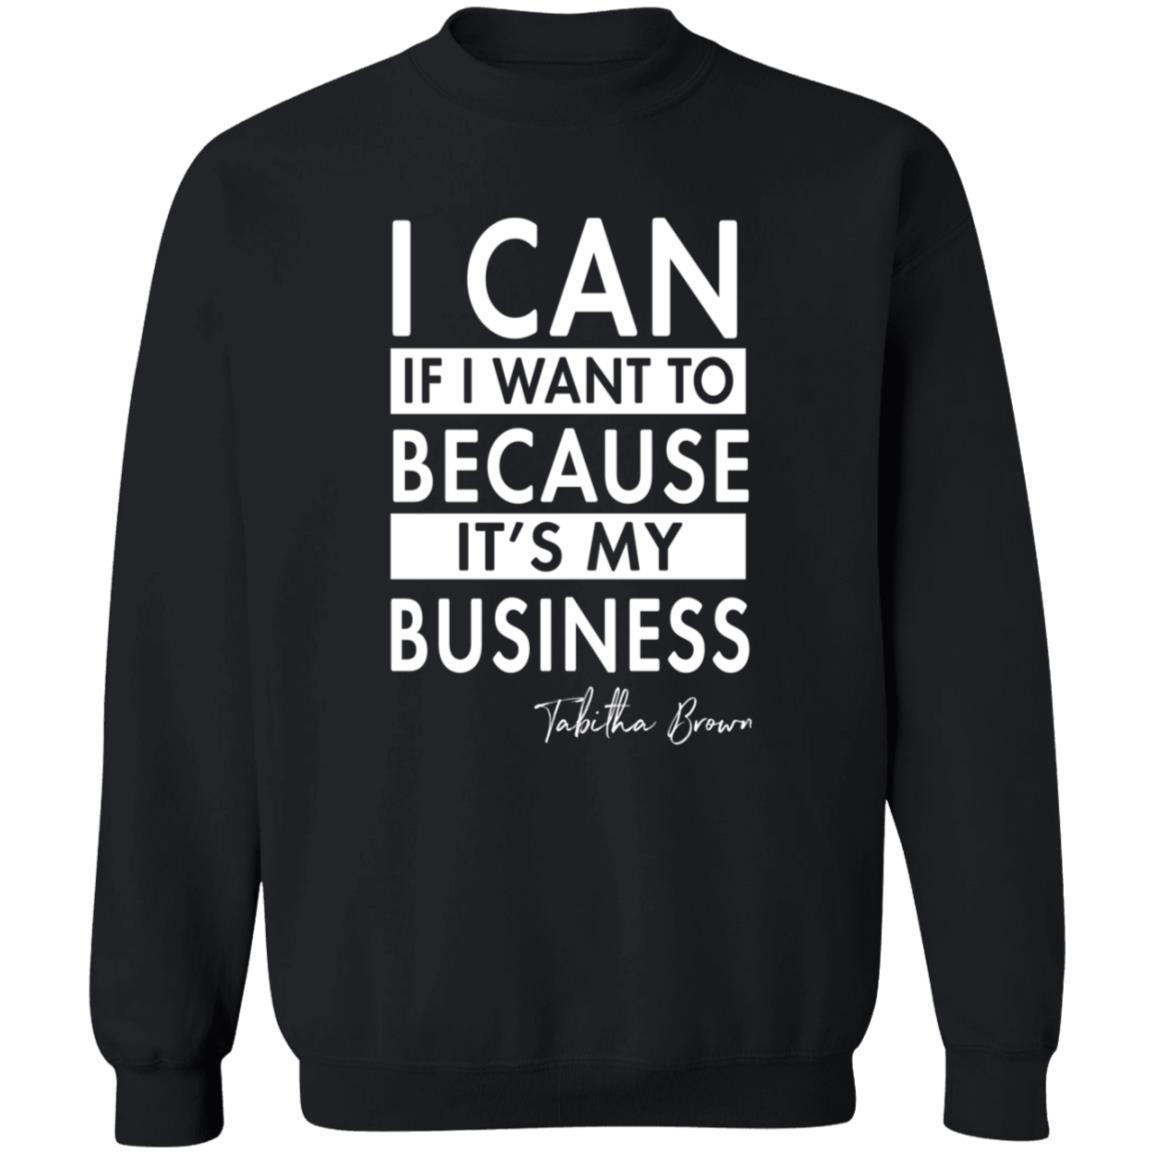 Giulianateeco I Can If I Want to Because It's My Business Tabitha Brown Sweatshirt